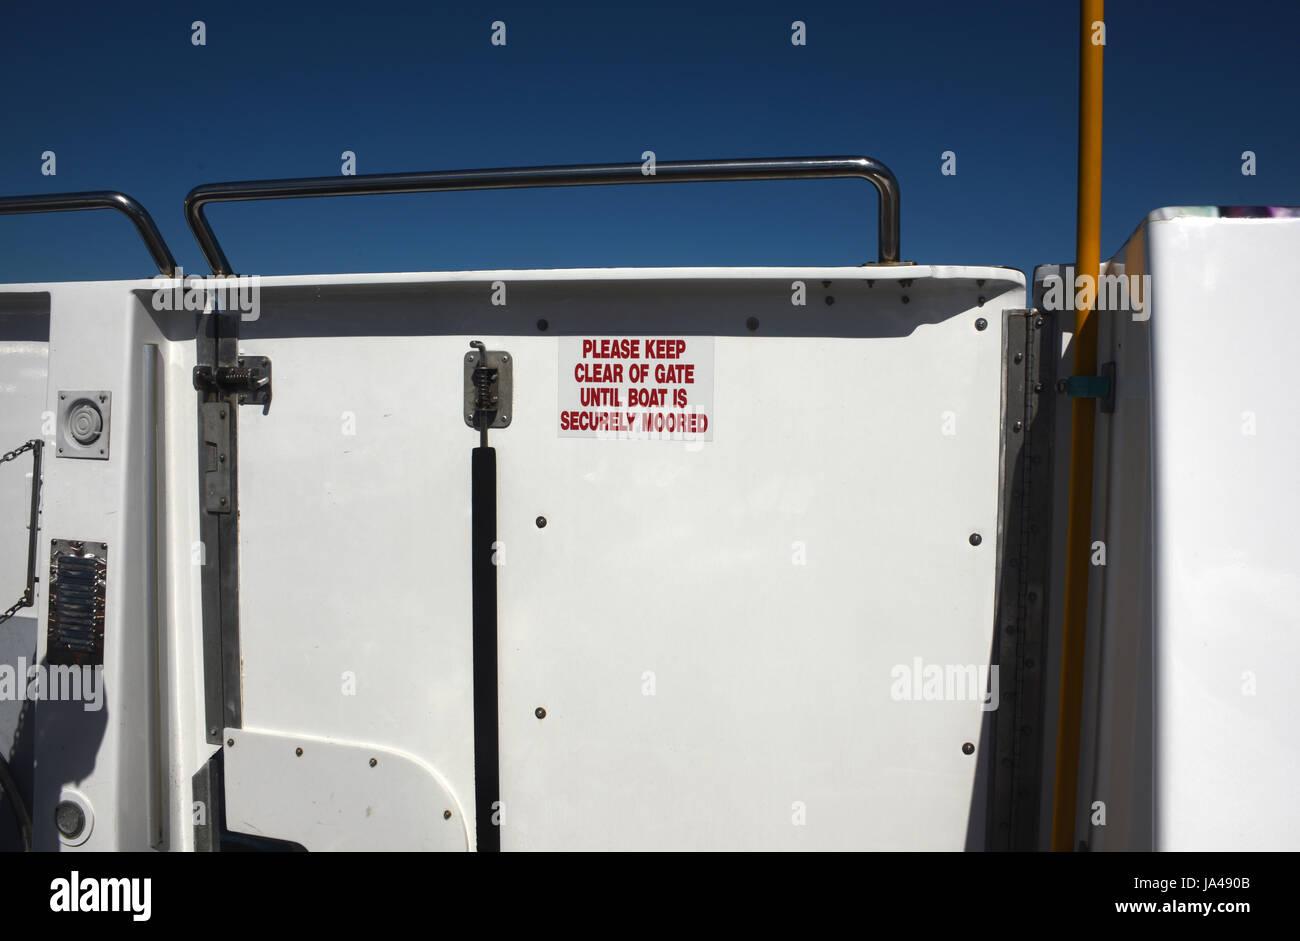 Brisbane, Australia: 'Please Keep Clear of Gate' sign on CityCat passenger ferry - Stock Image